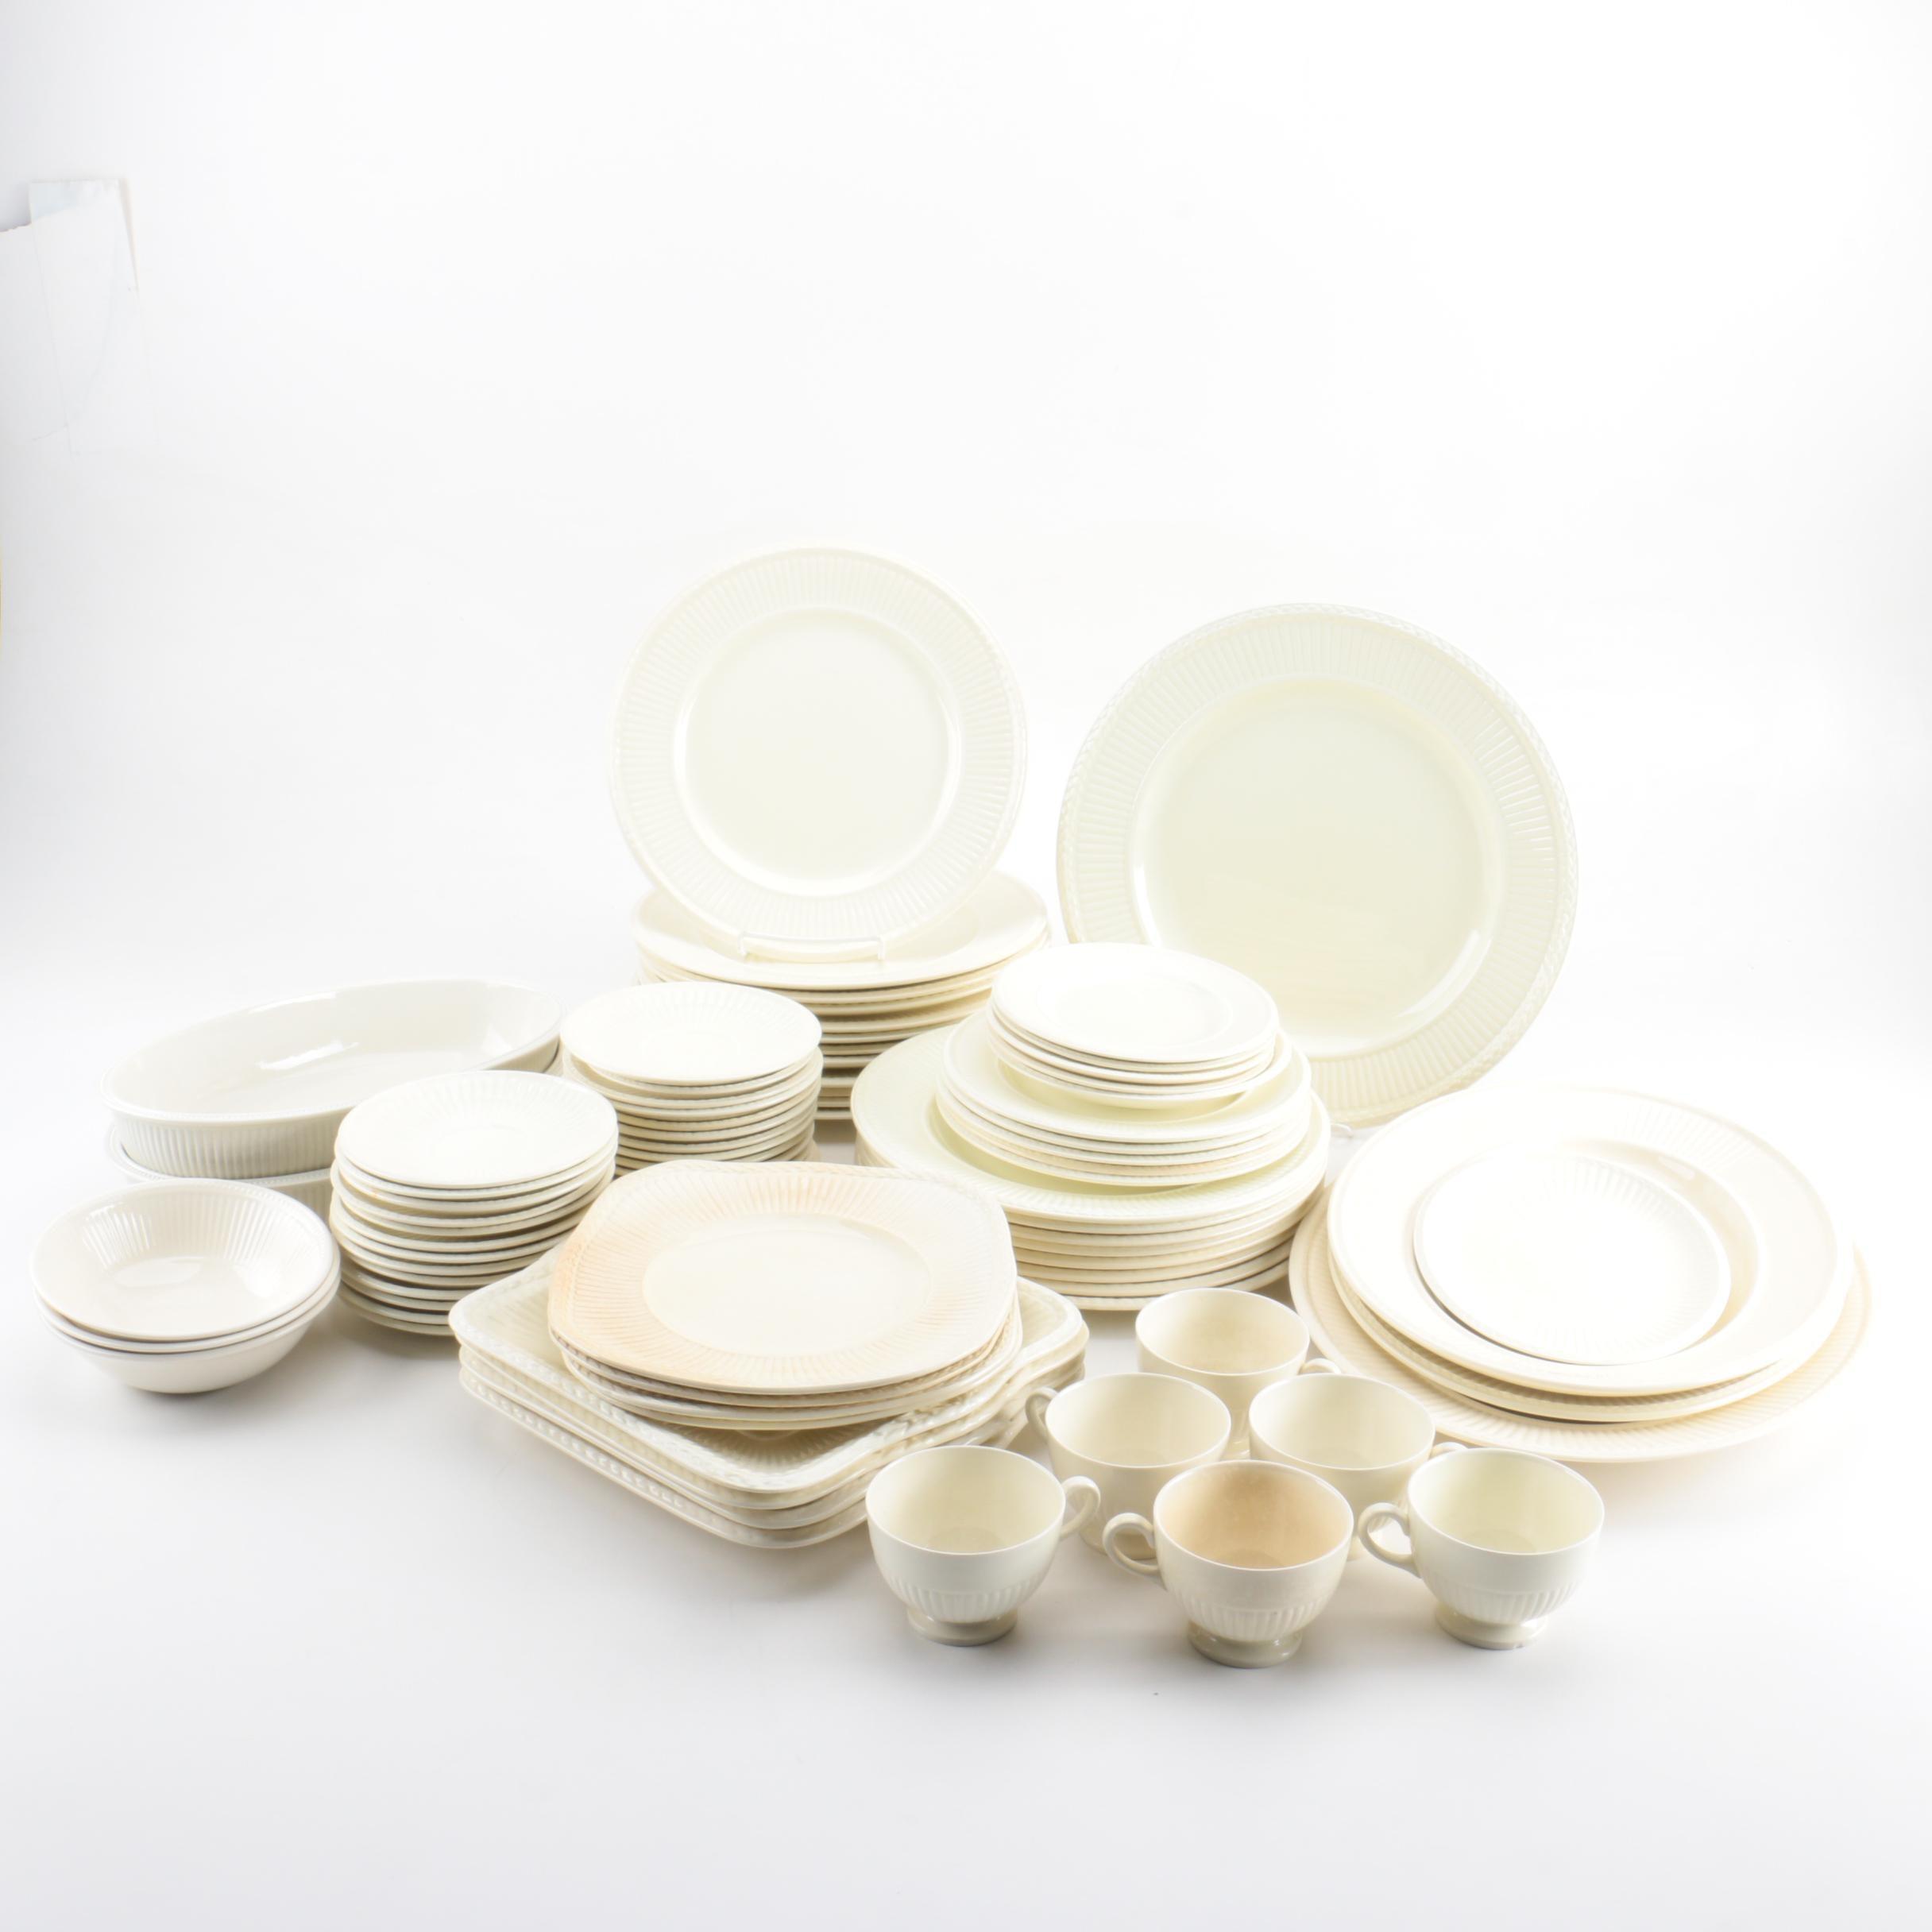 Wedgwood  Edme  and  Windsor  Porcelain Dinnerware ...  sc 1 st  EBTH.com & Wedgwood